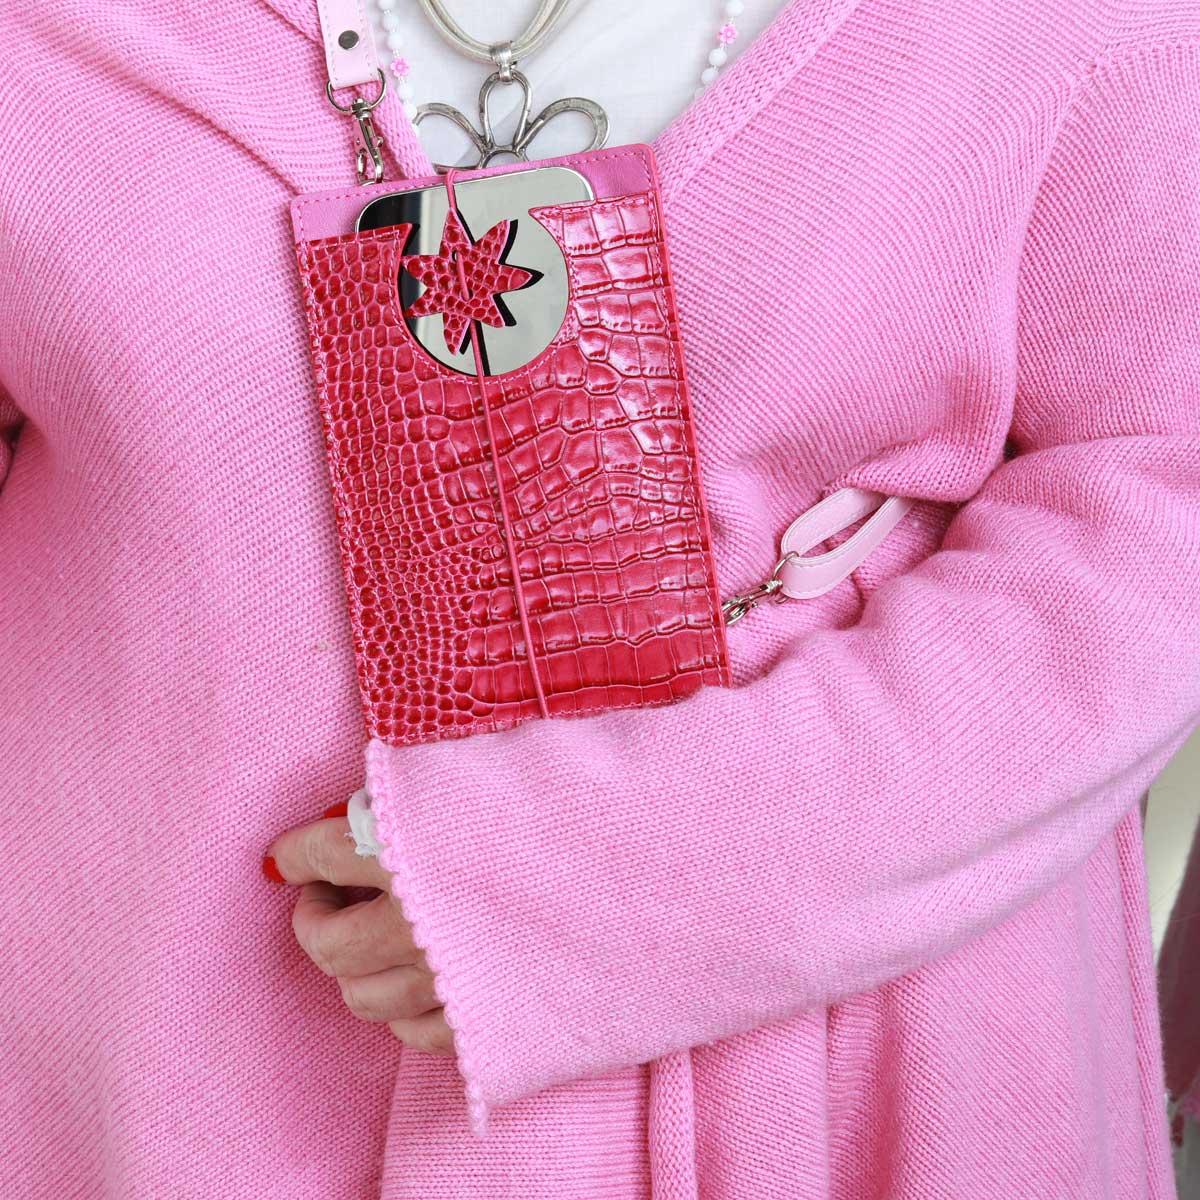 elfenklang handytaschen zum umhängen kroko pink